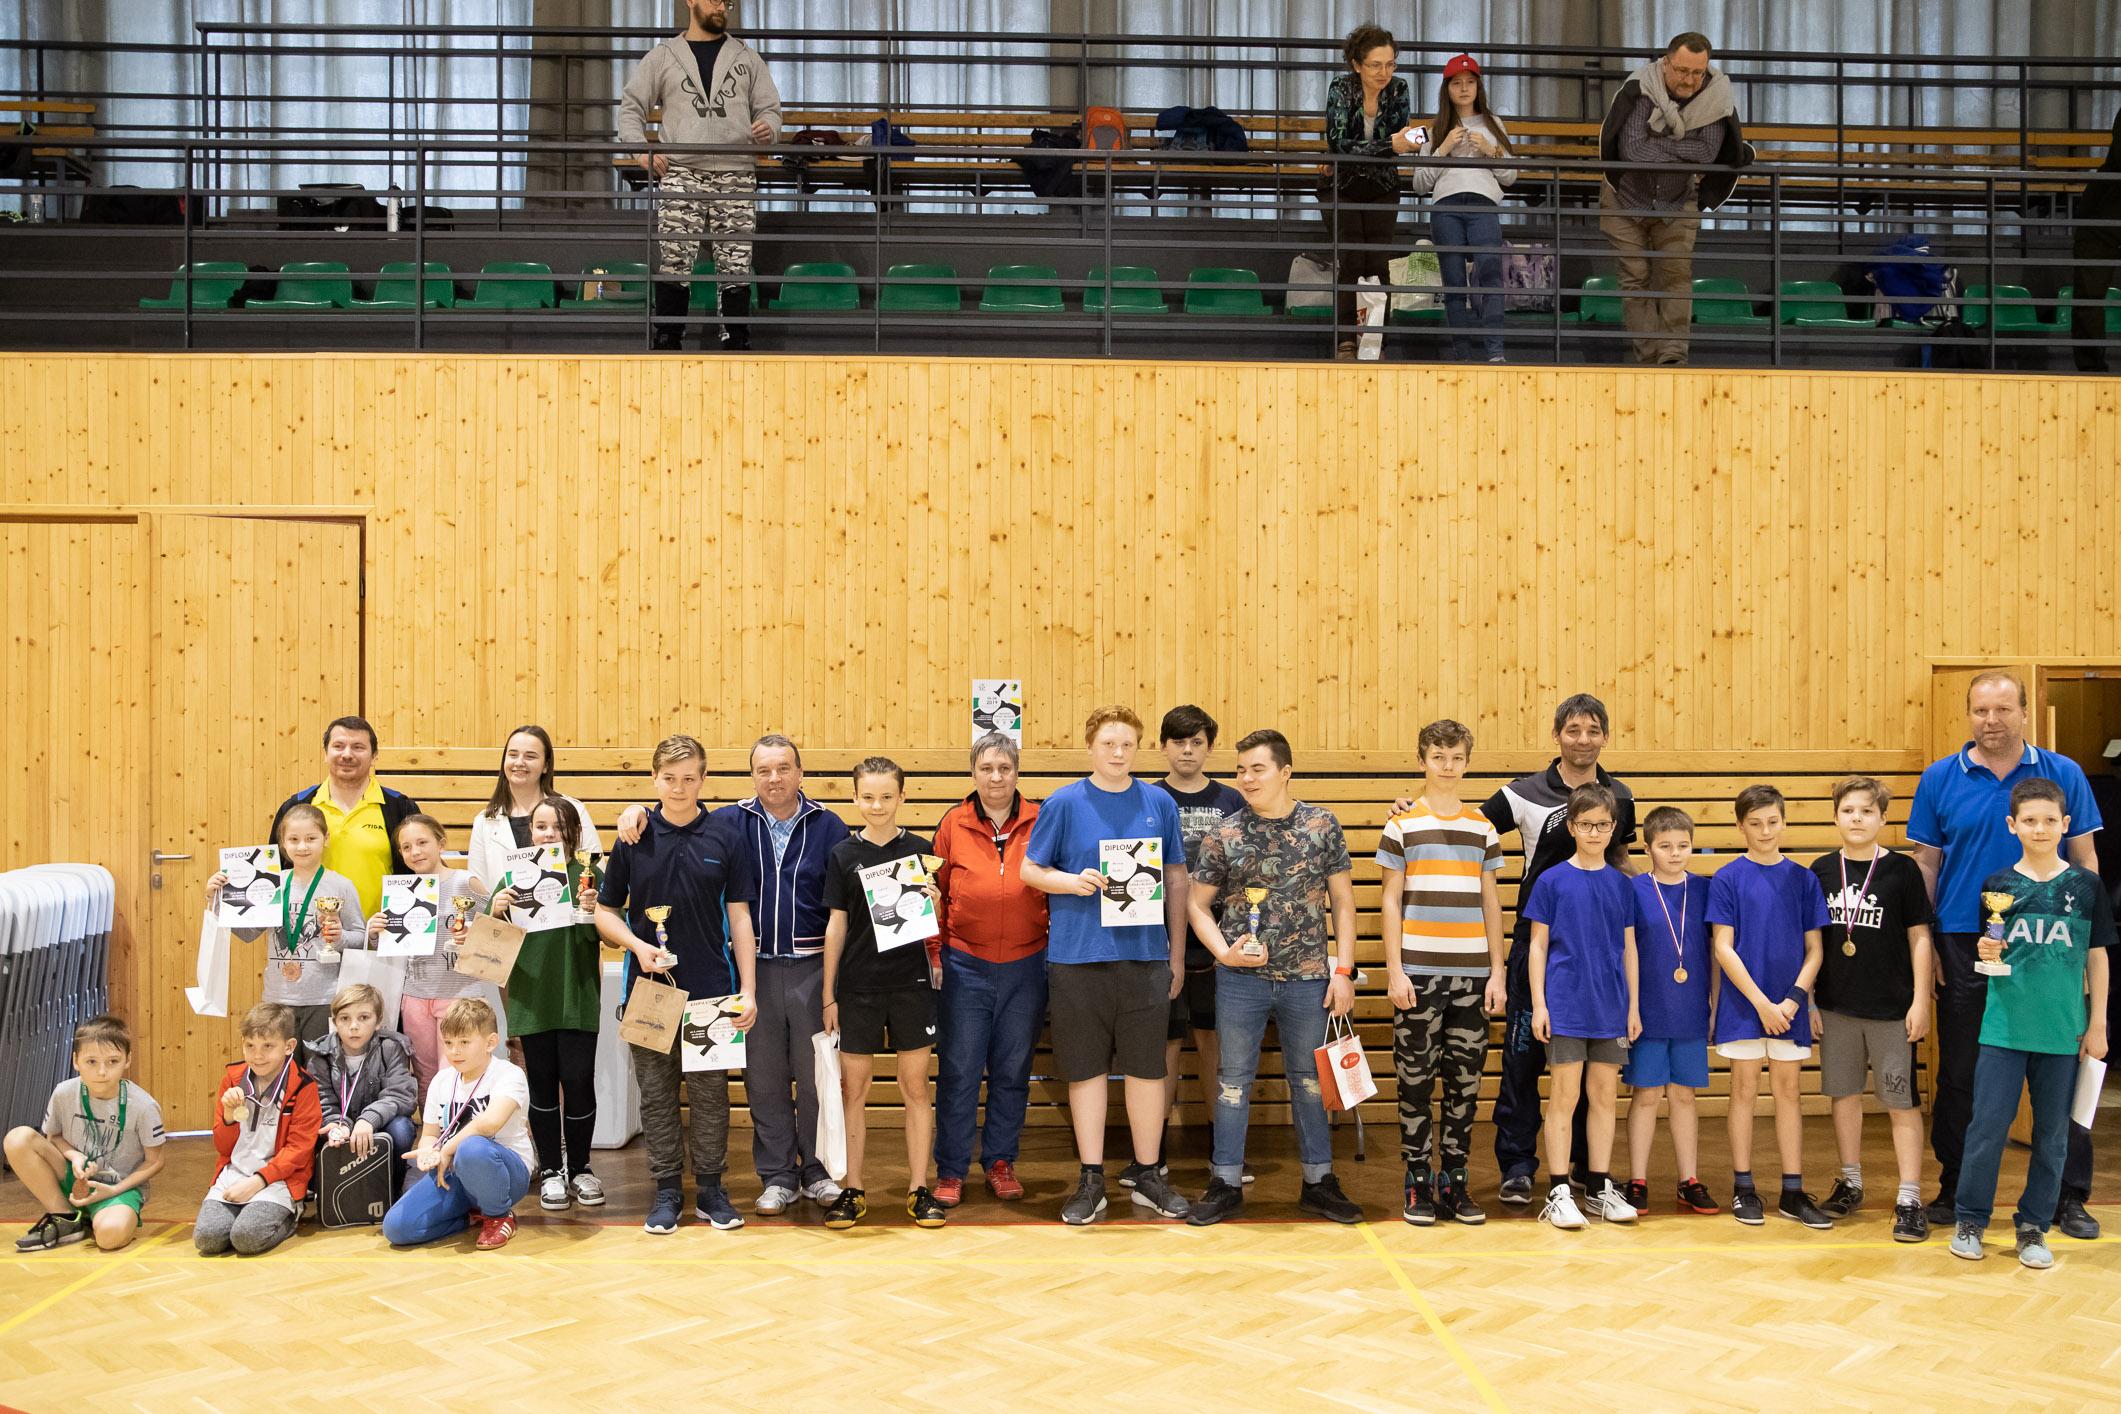 oblast-turnaj-mladeze-zv-dt-ka-14